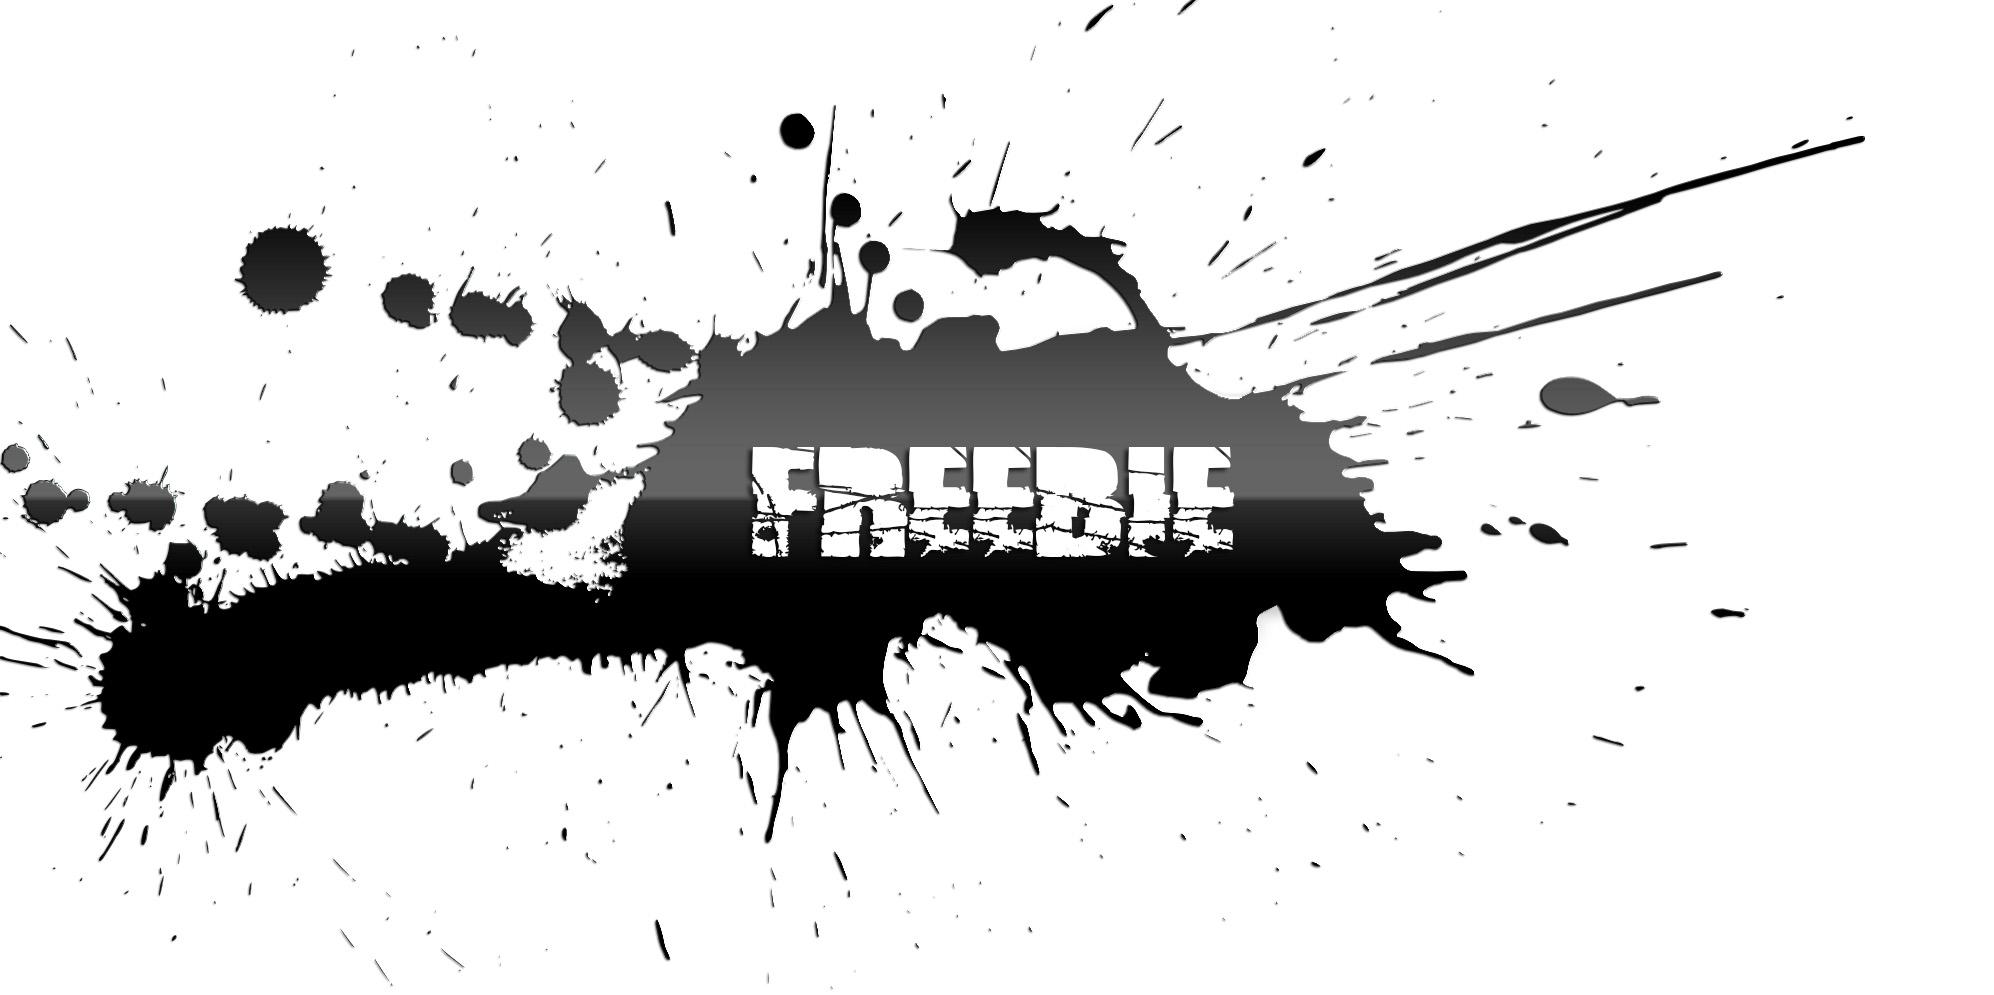 Freebie Splash.jpg